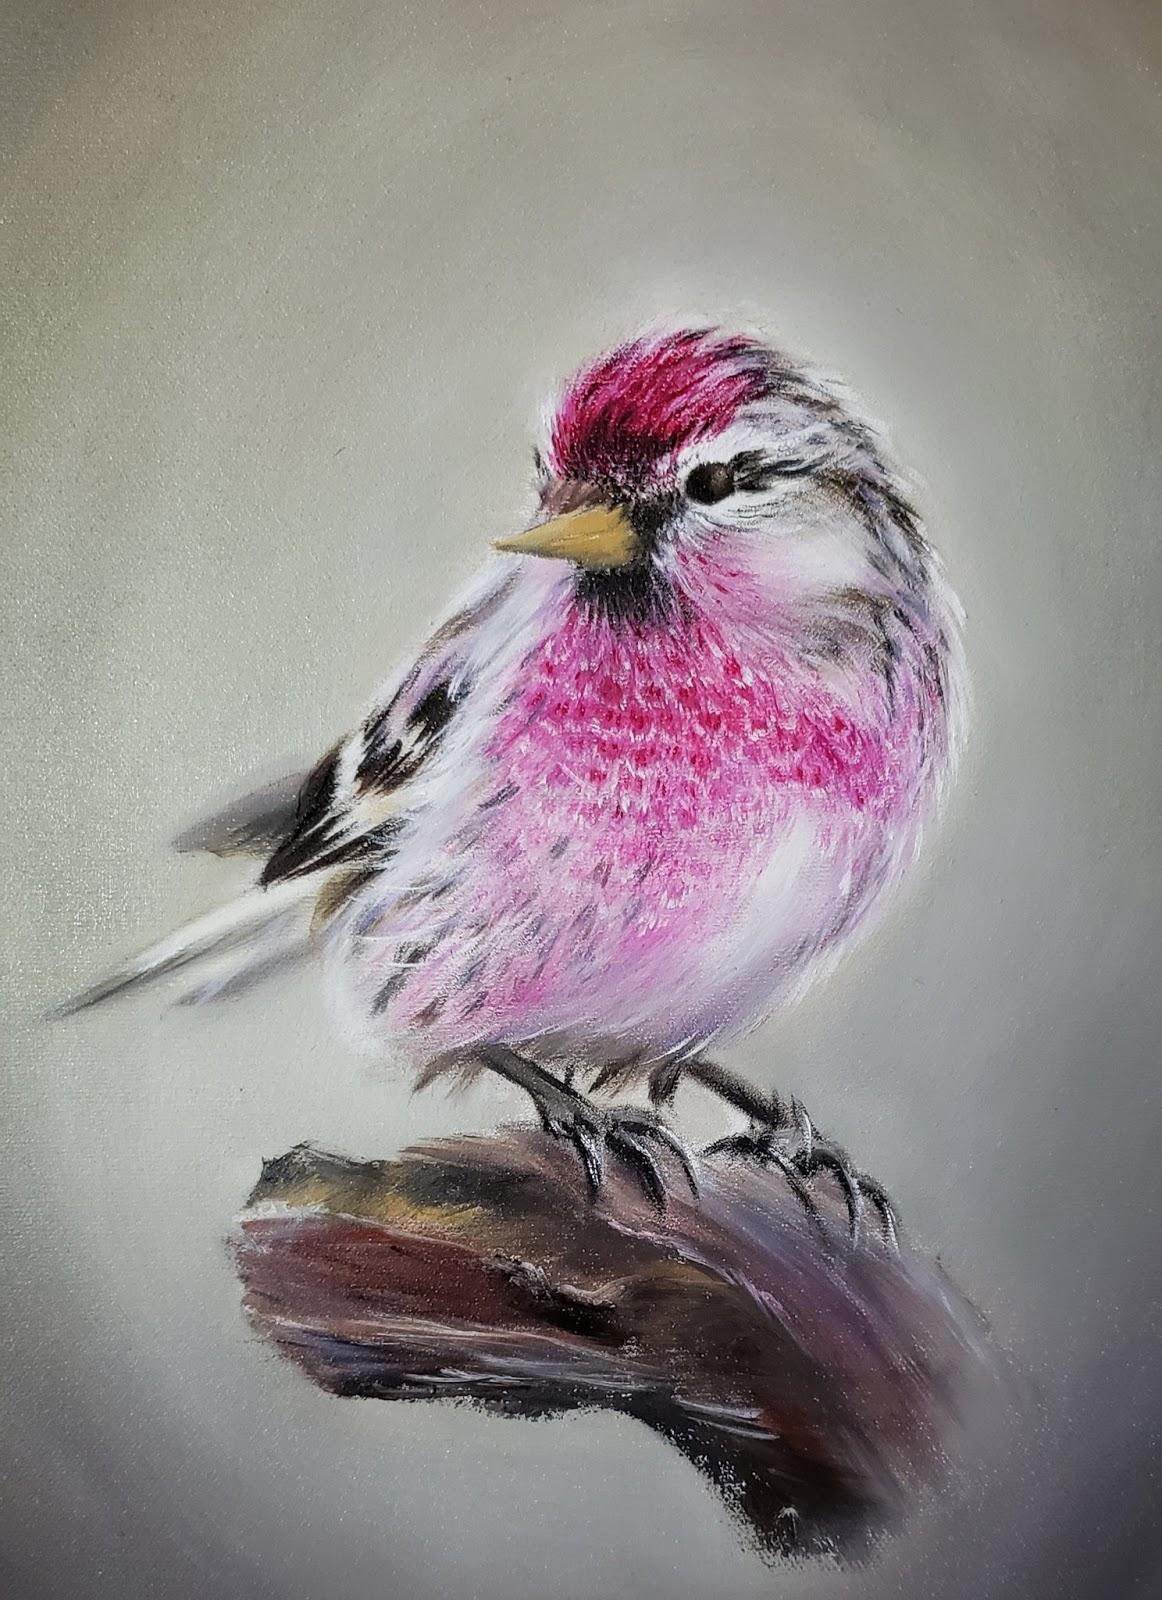 Нерсель зур Мехлен (Nersel zur Muehlen) - турецкий художник